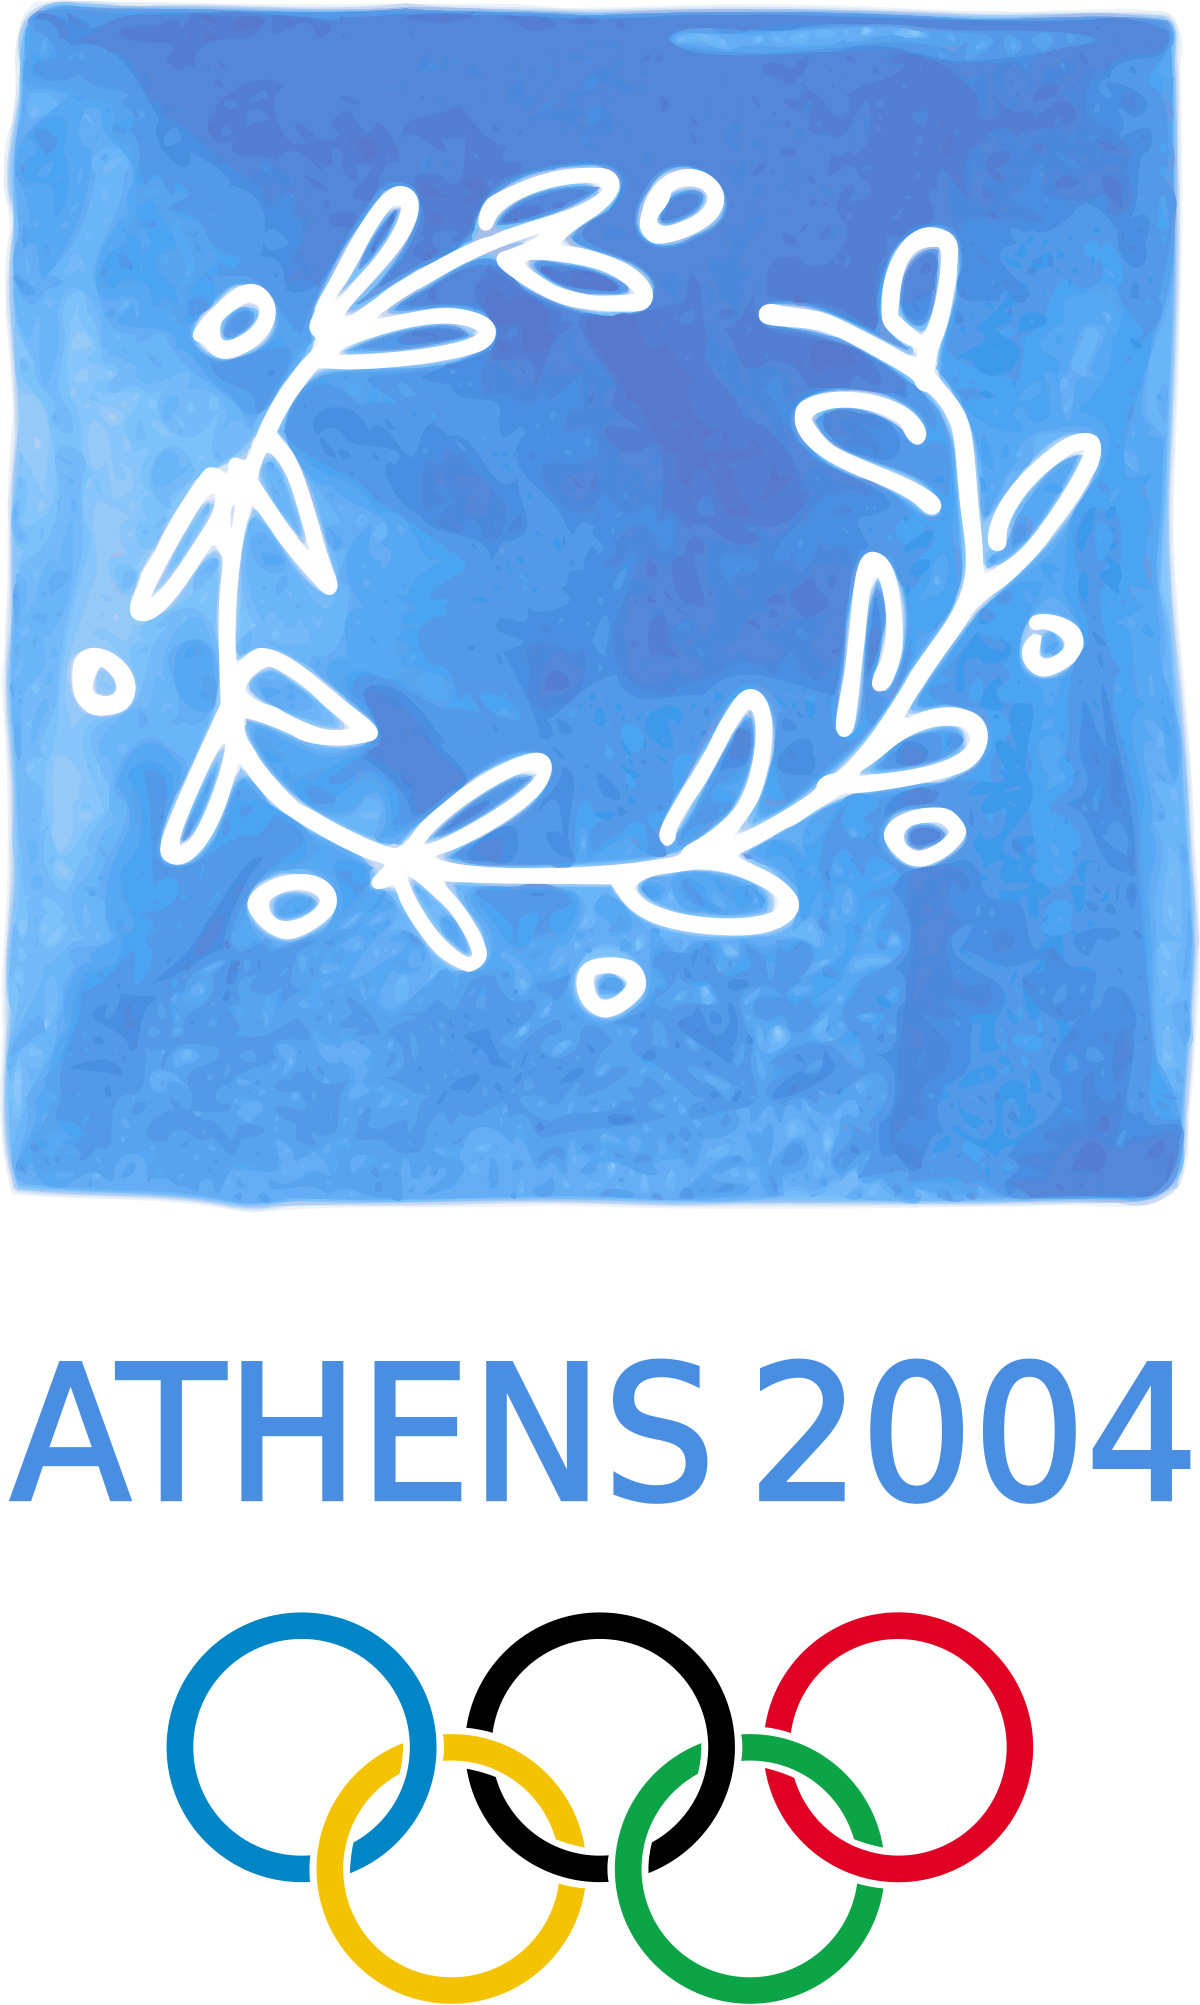 2004 Athens